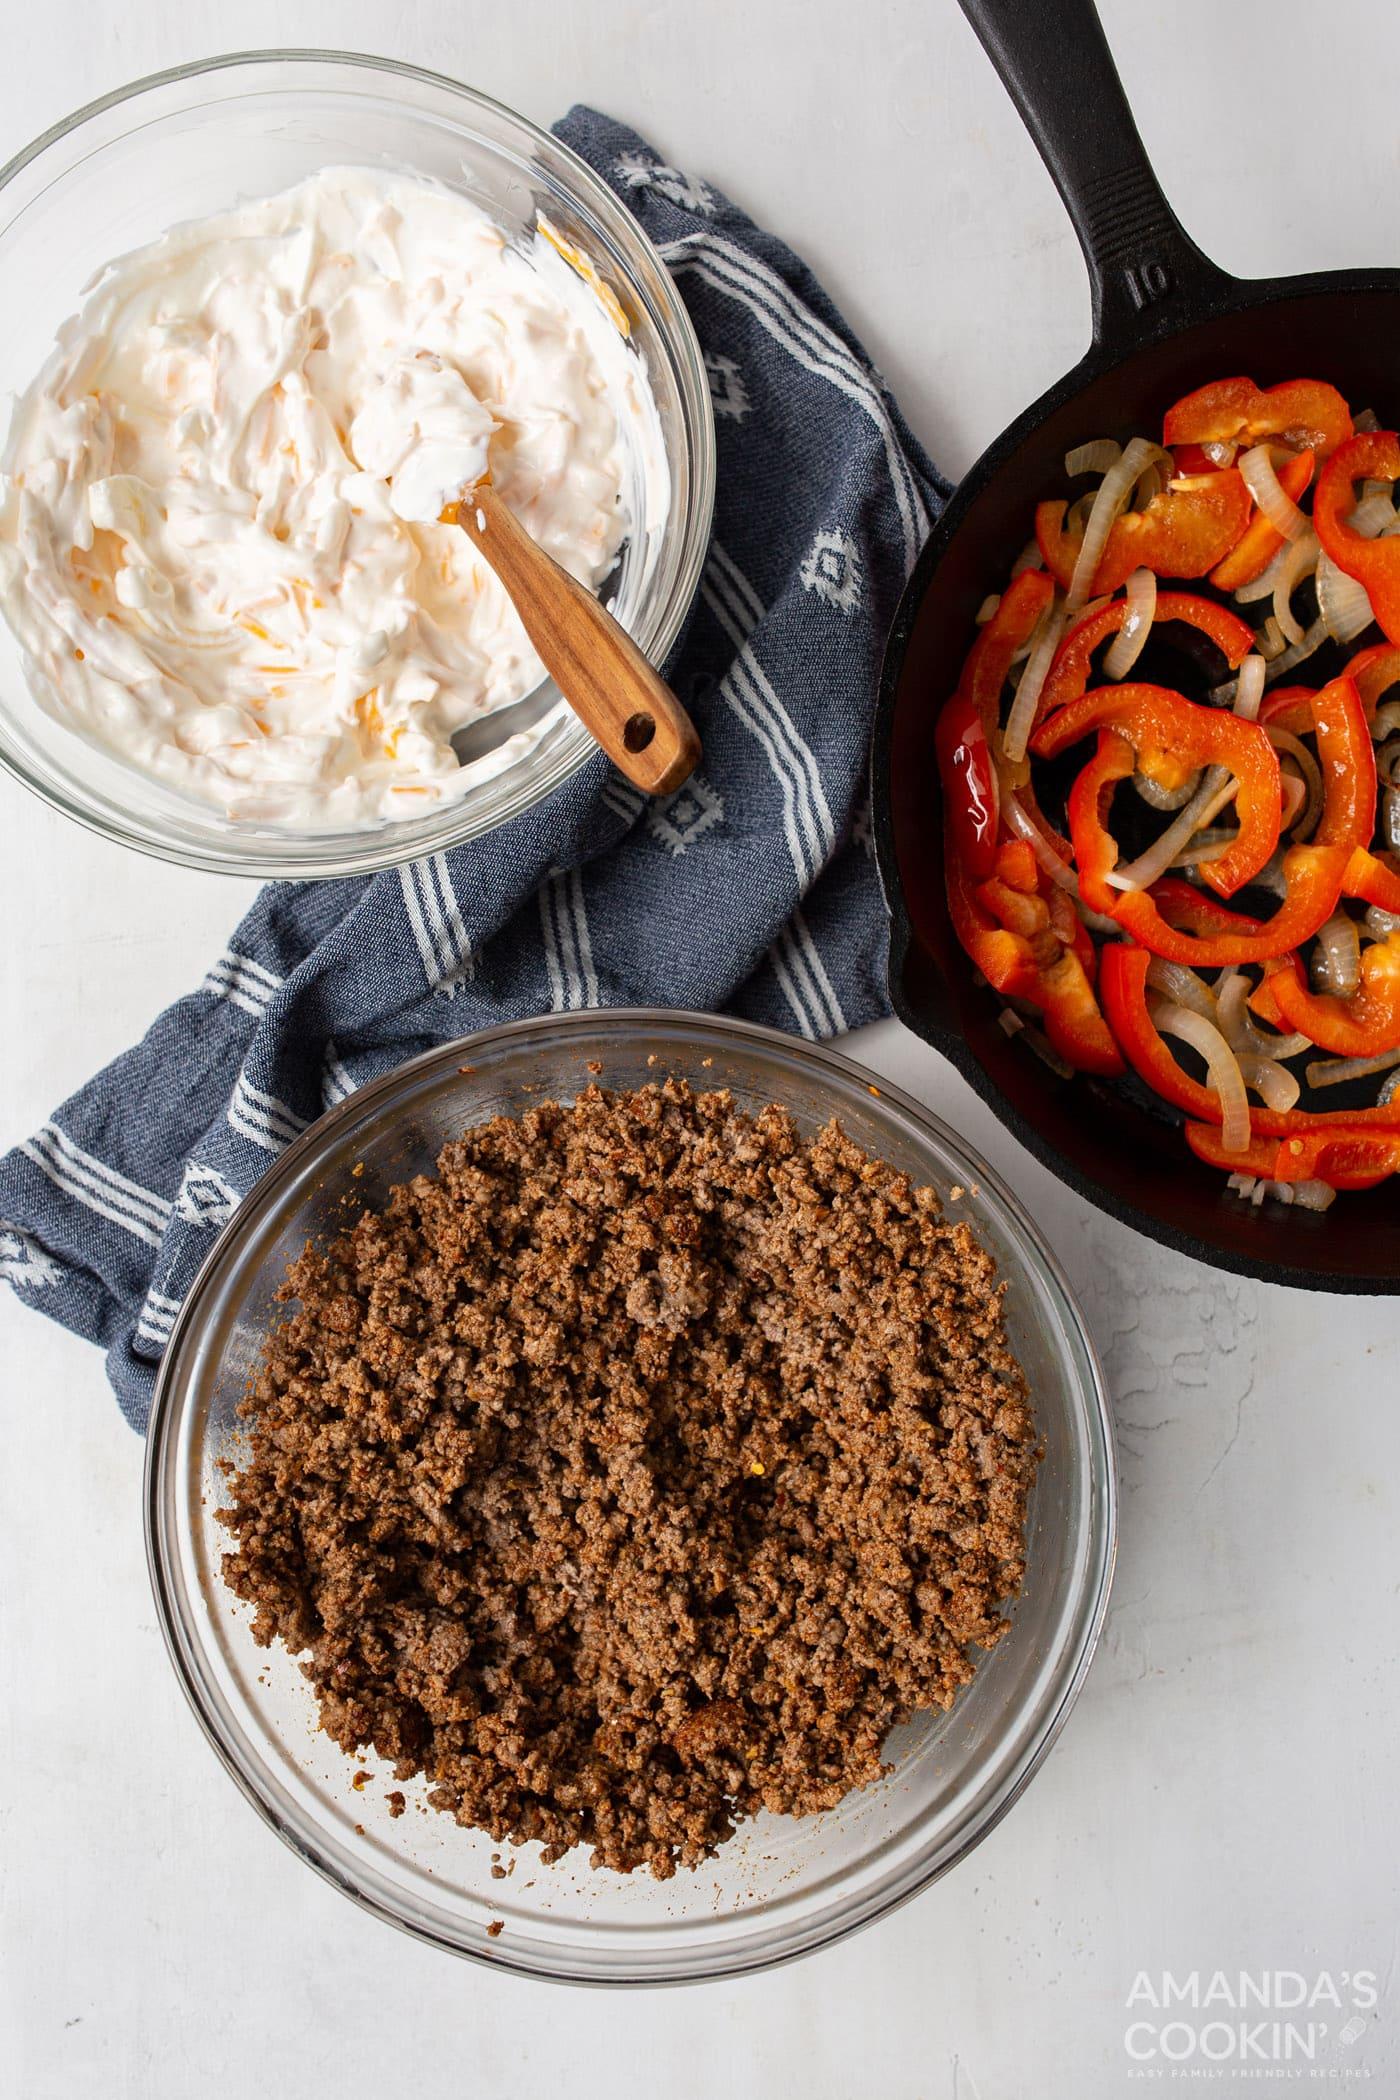 ground beef, sour cream mixture, and veggies overhead